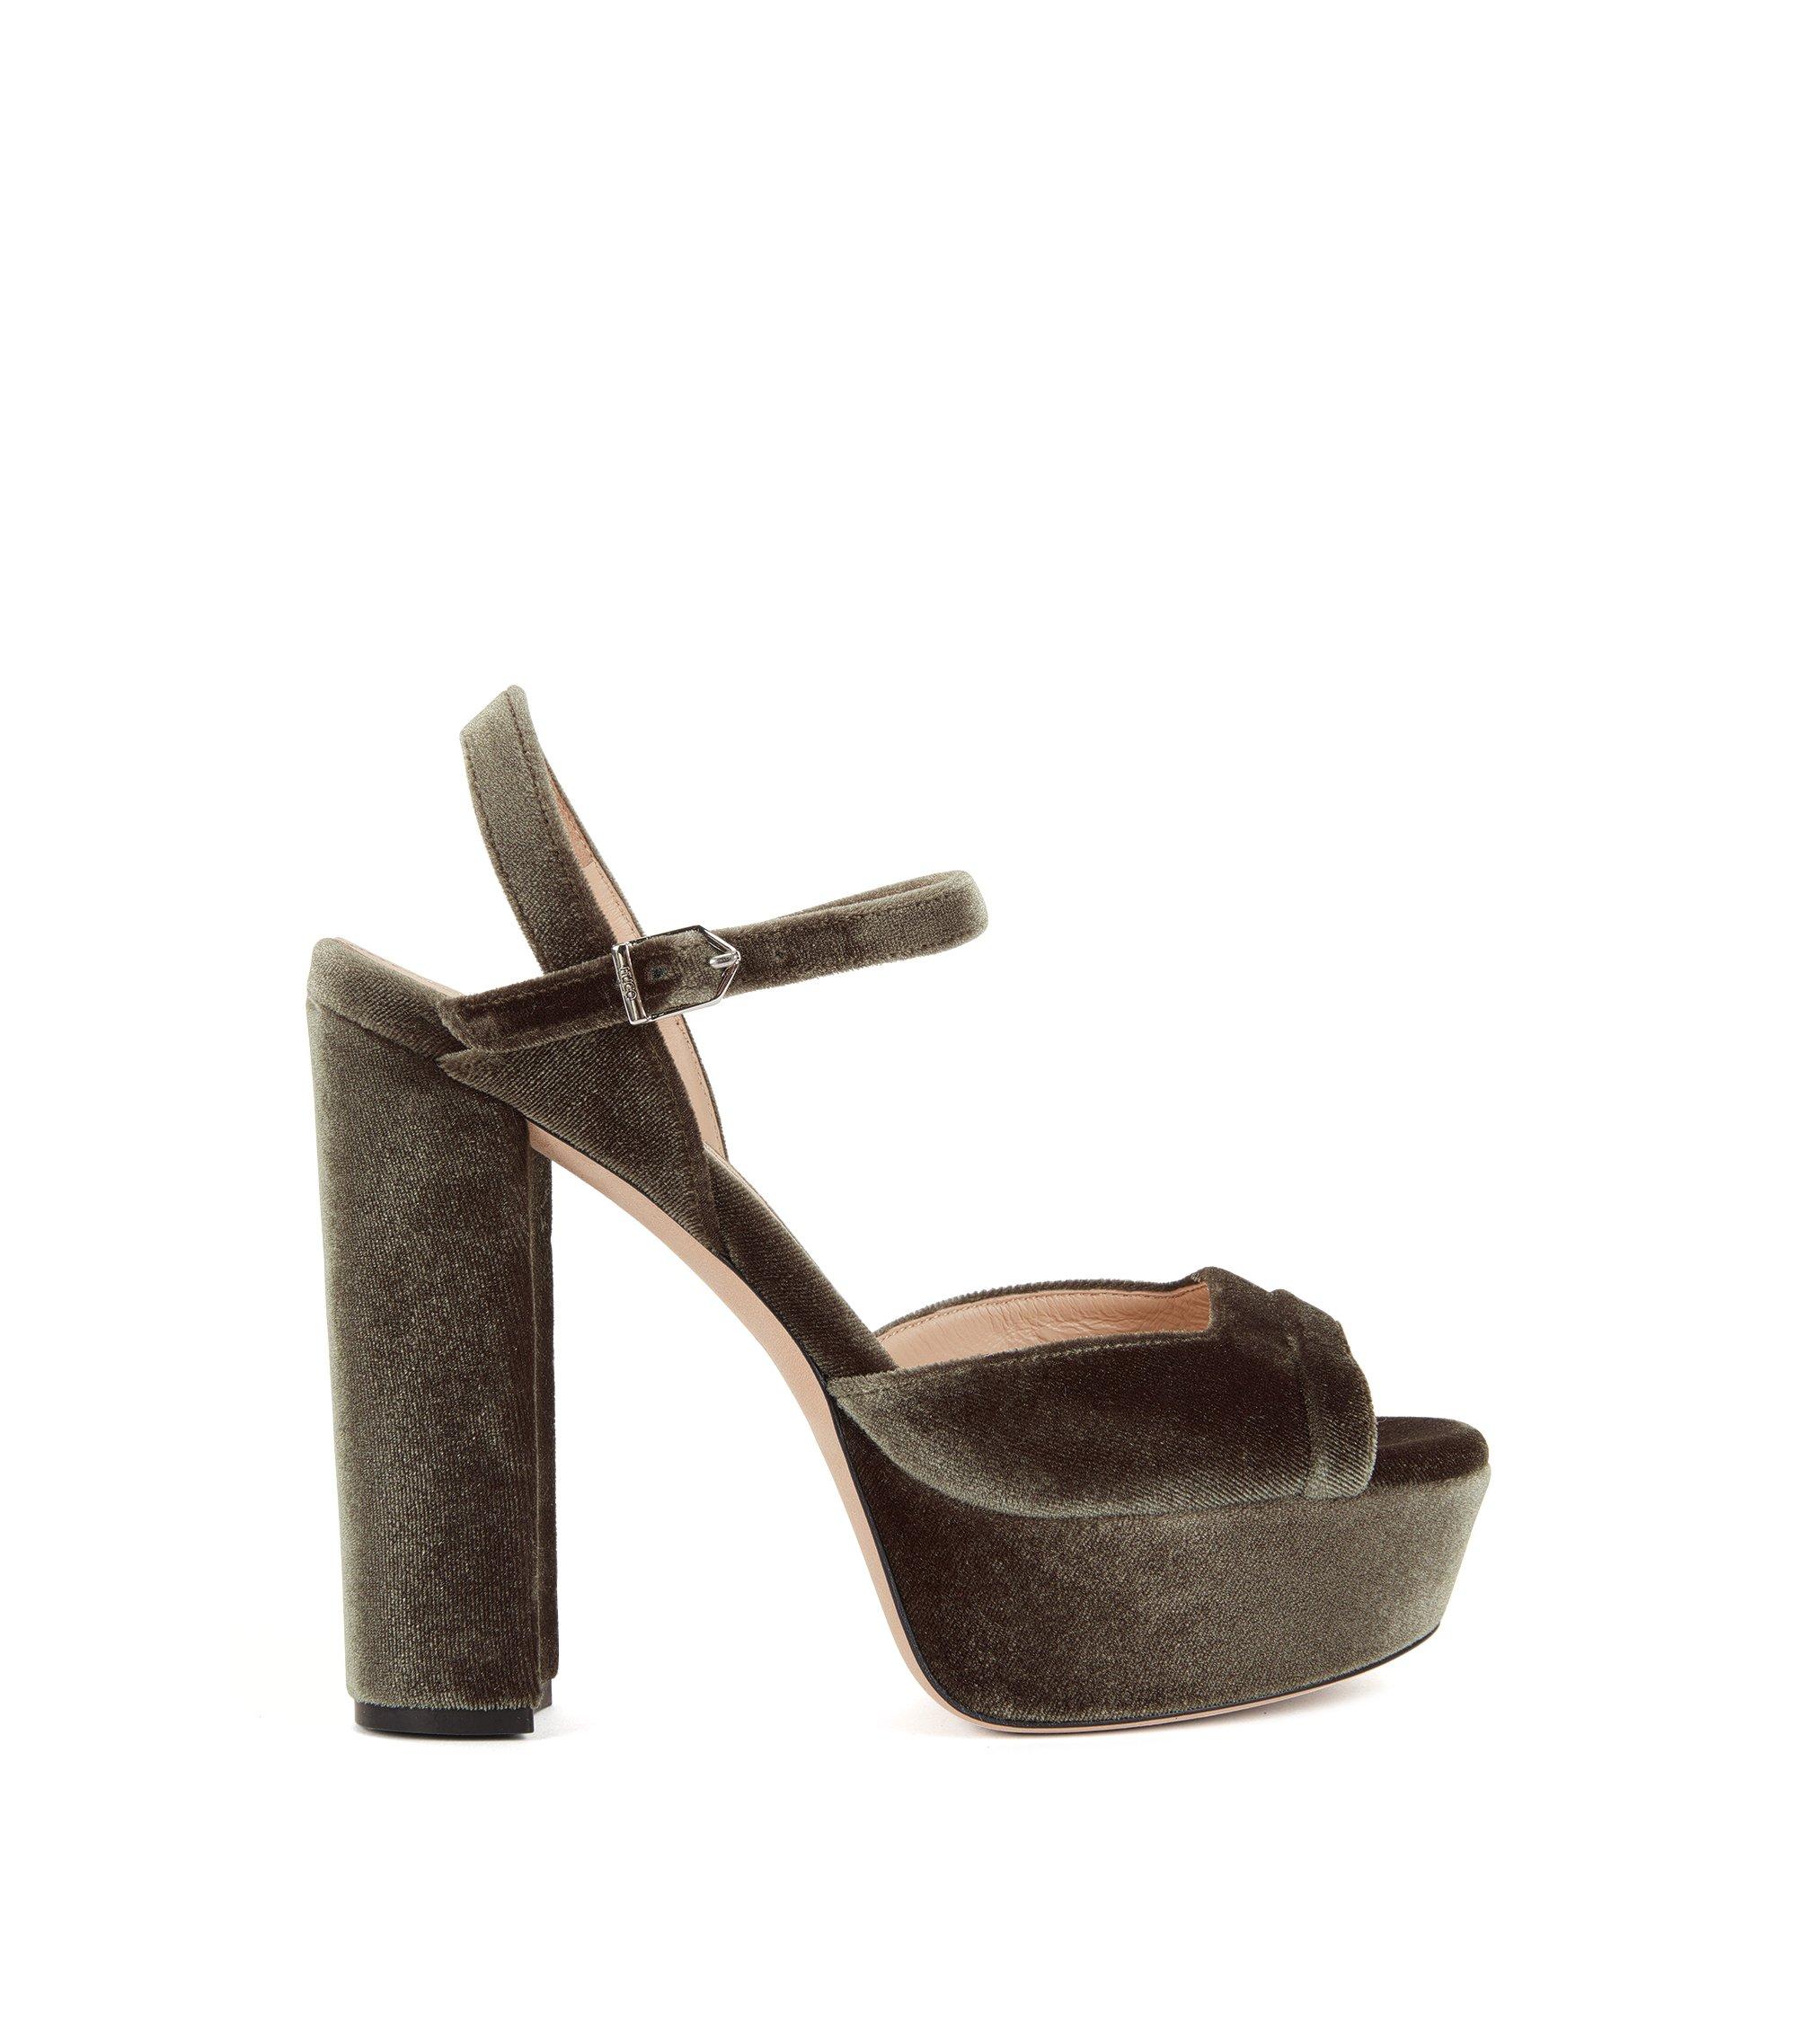 Plateau-Sandalen aus weichem Samt, Khaki